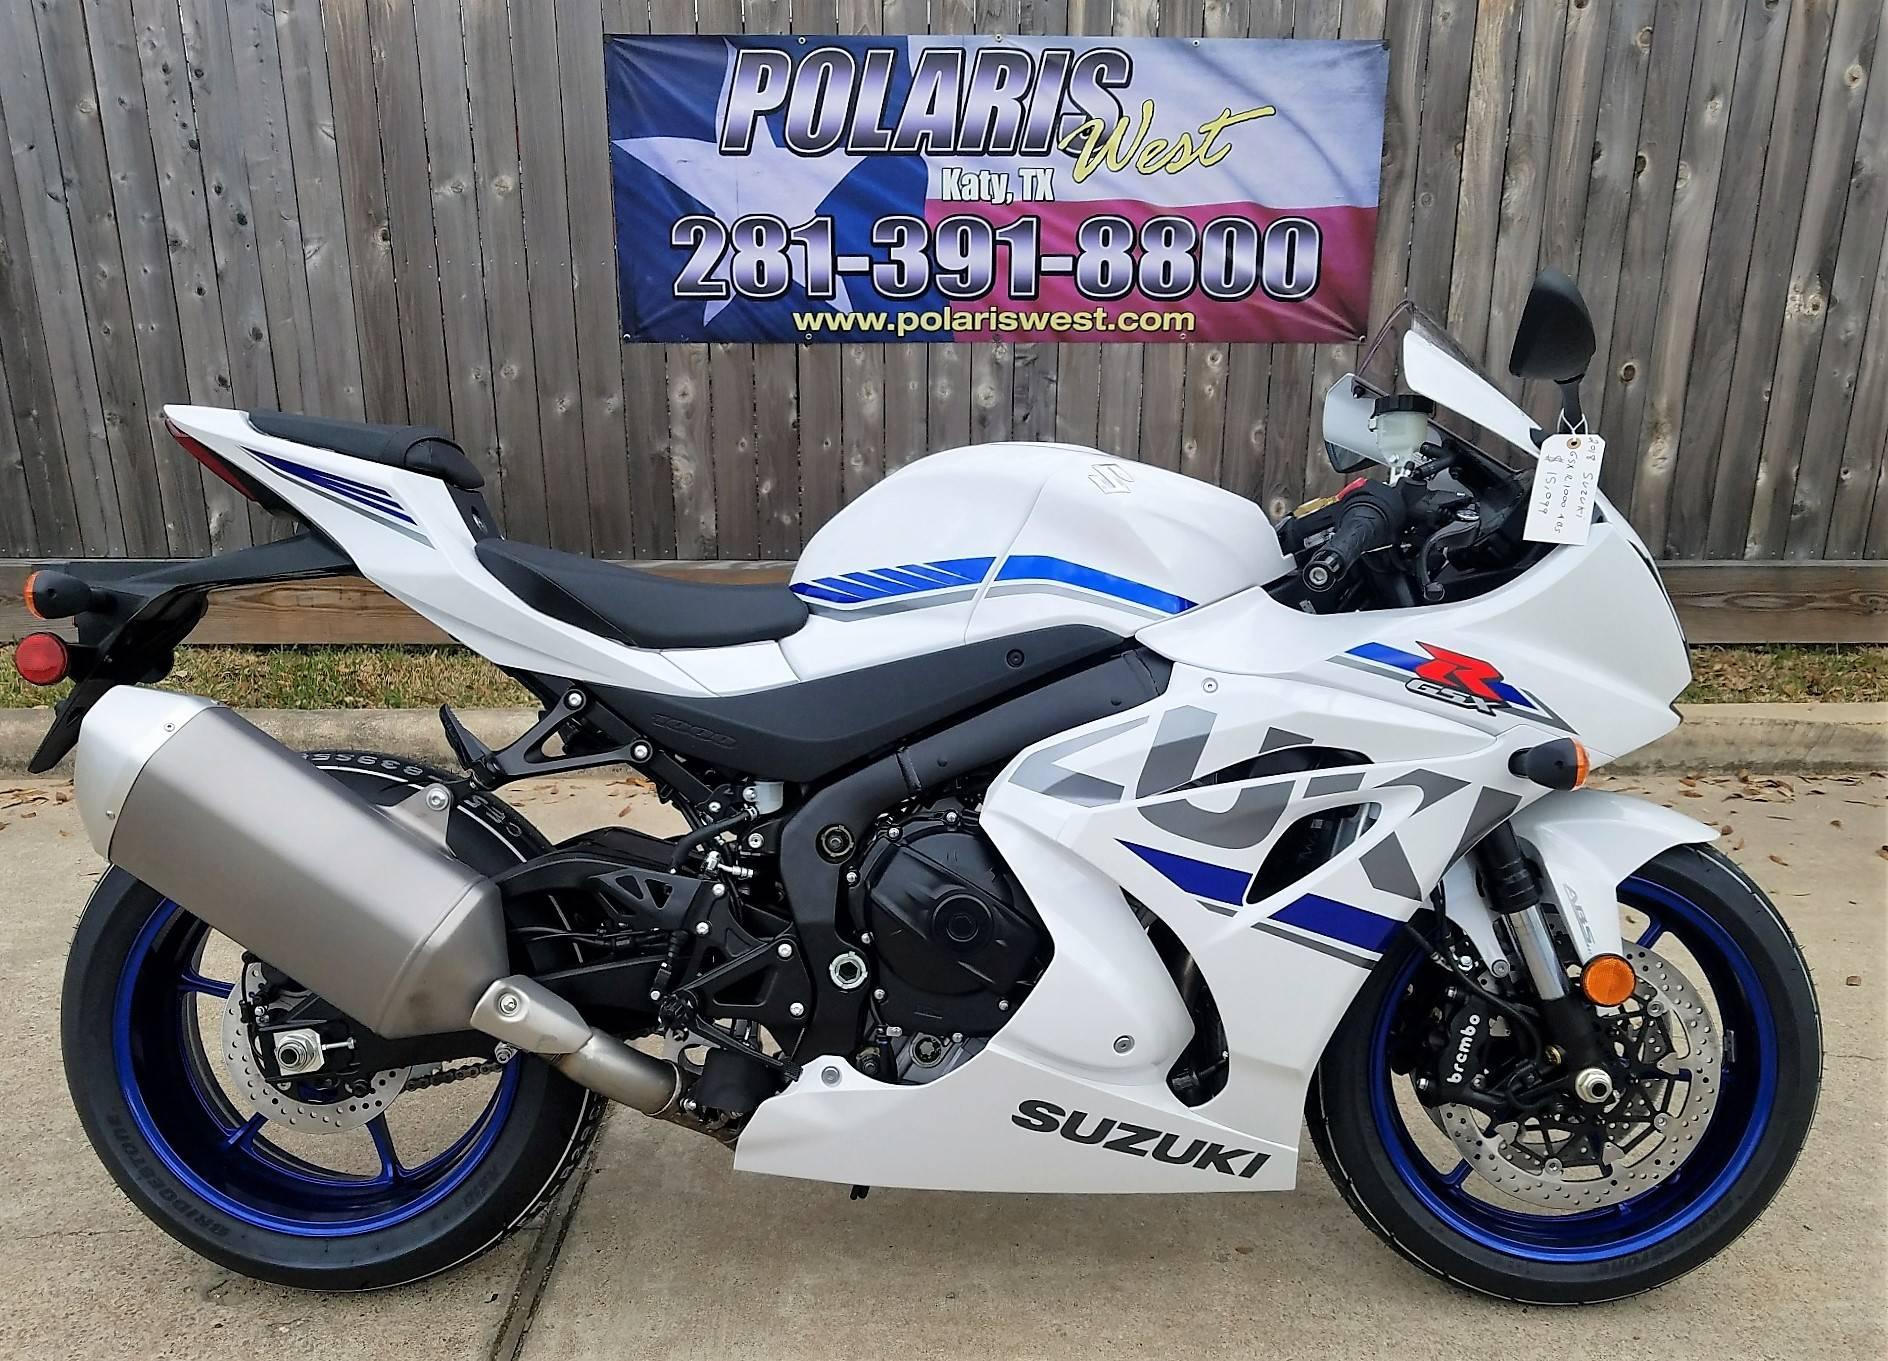 New 2018 Suzuki Gsx R1000 Abs Motorcycles In Katy Tx Stock Number